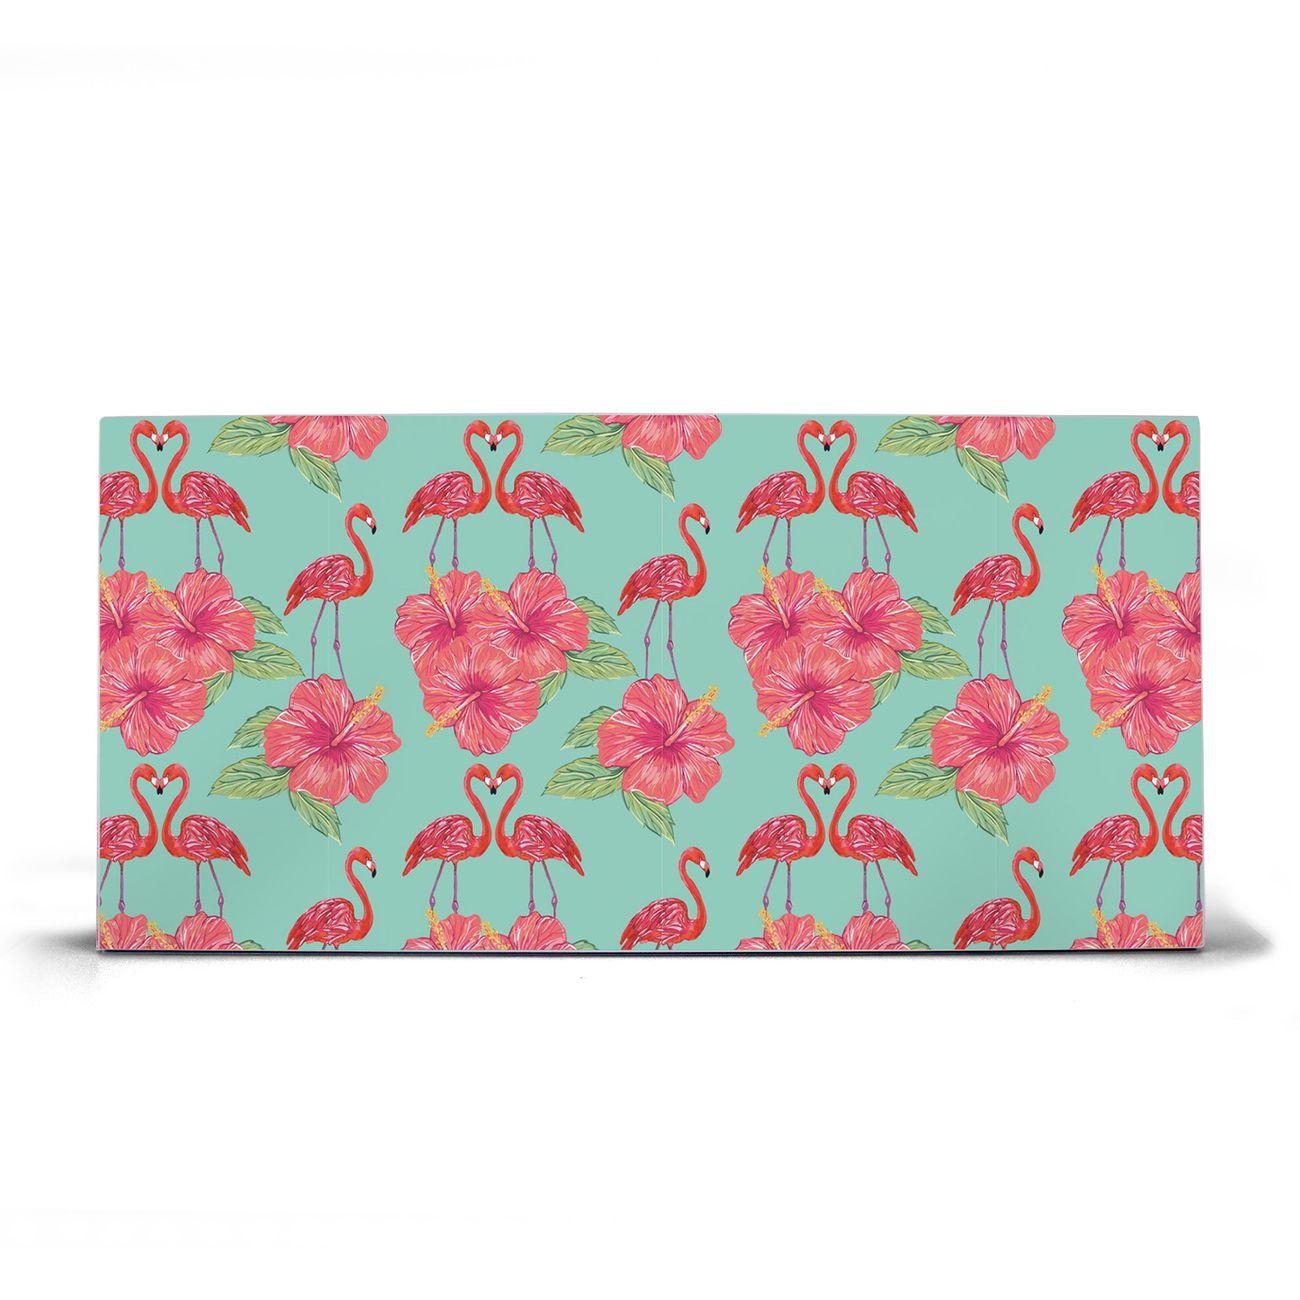 Magnettafel silber Querformat Flamingo Liebe